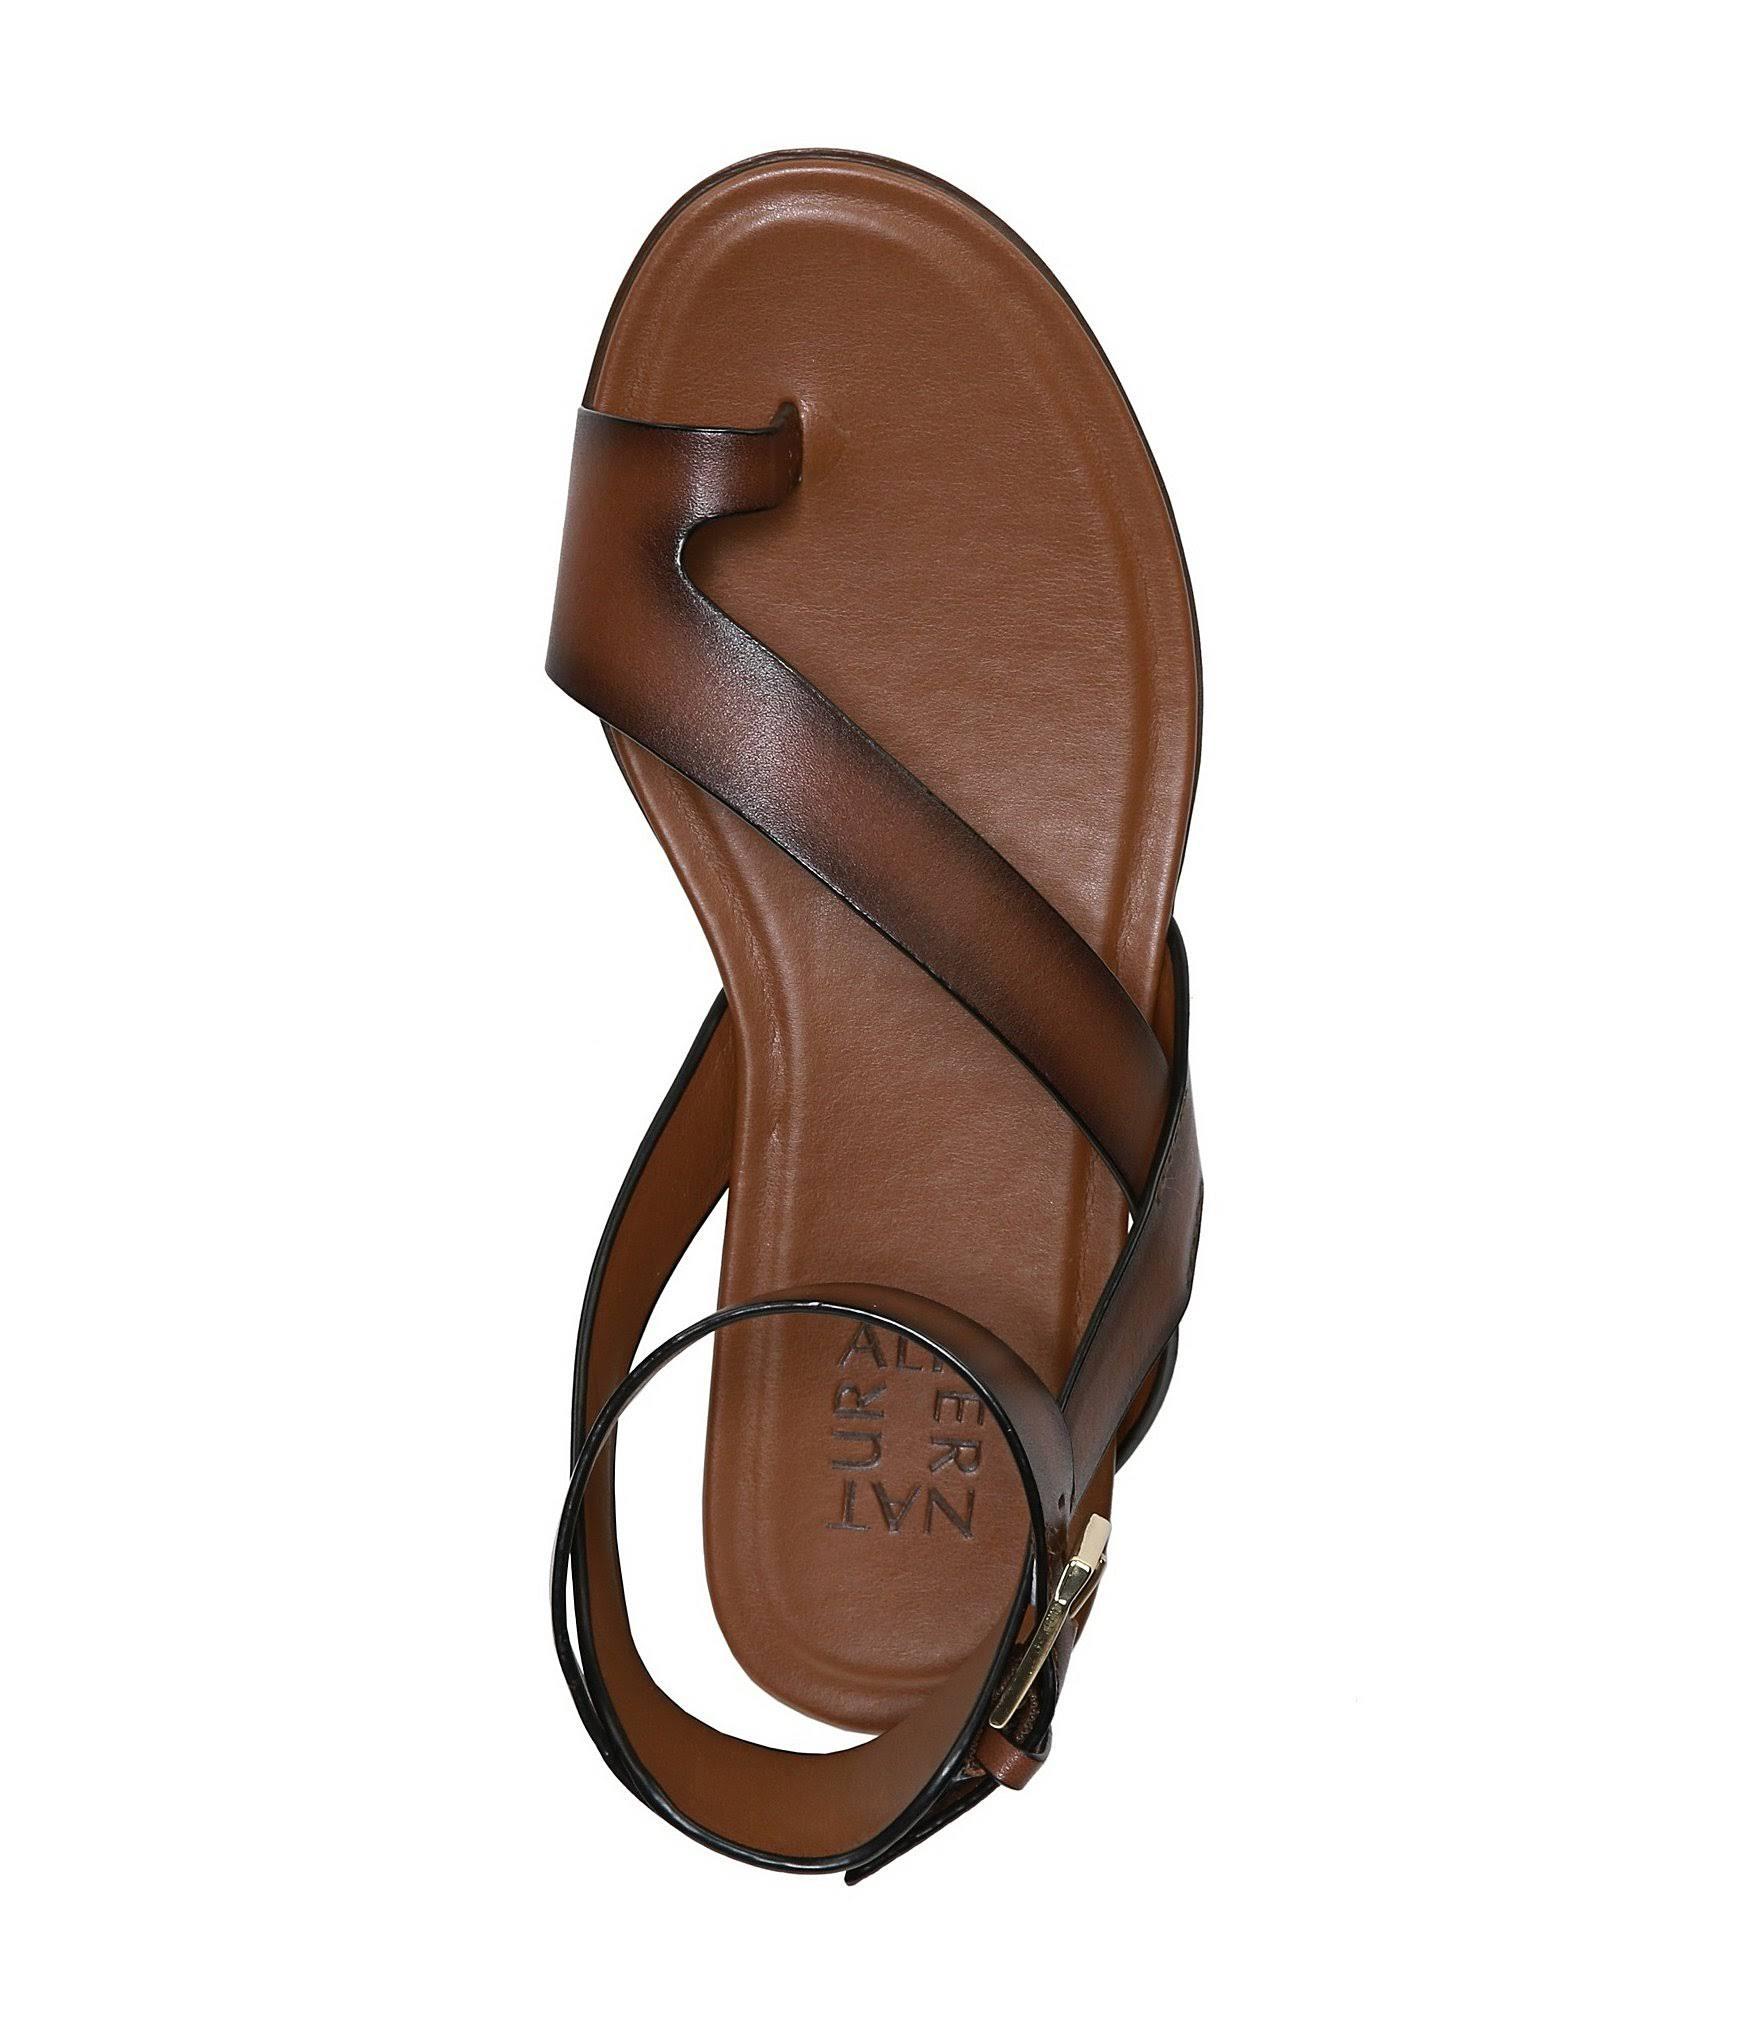 Sandalo NaturalizerMisura5Pelle Flat Da Marrone Donna Di Lodge Tally uTJF3lKc51